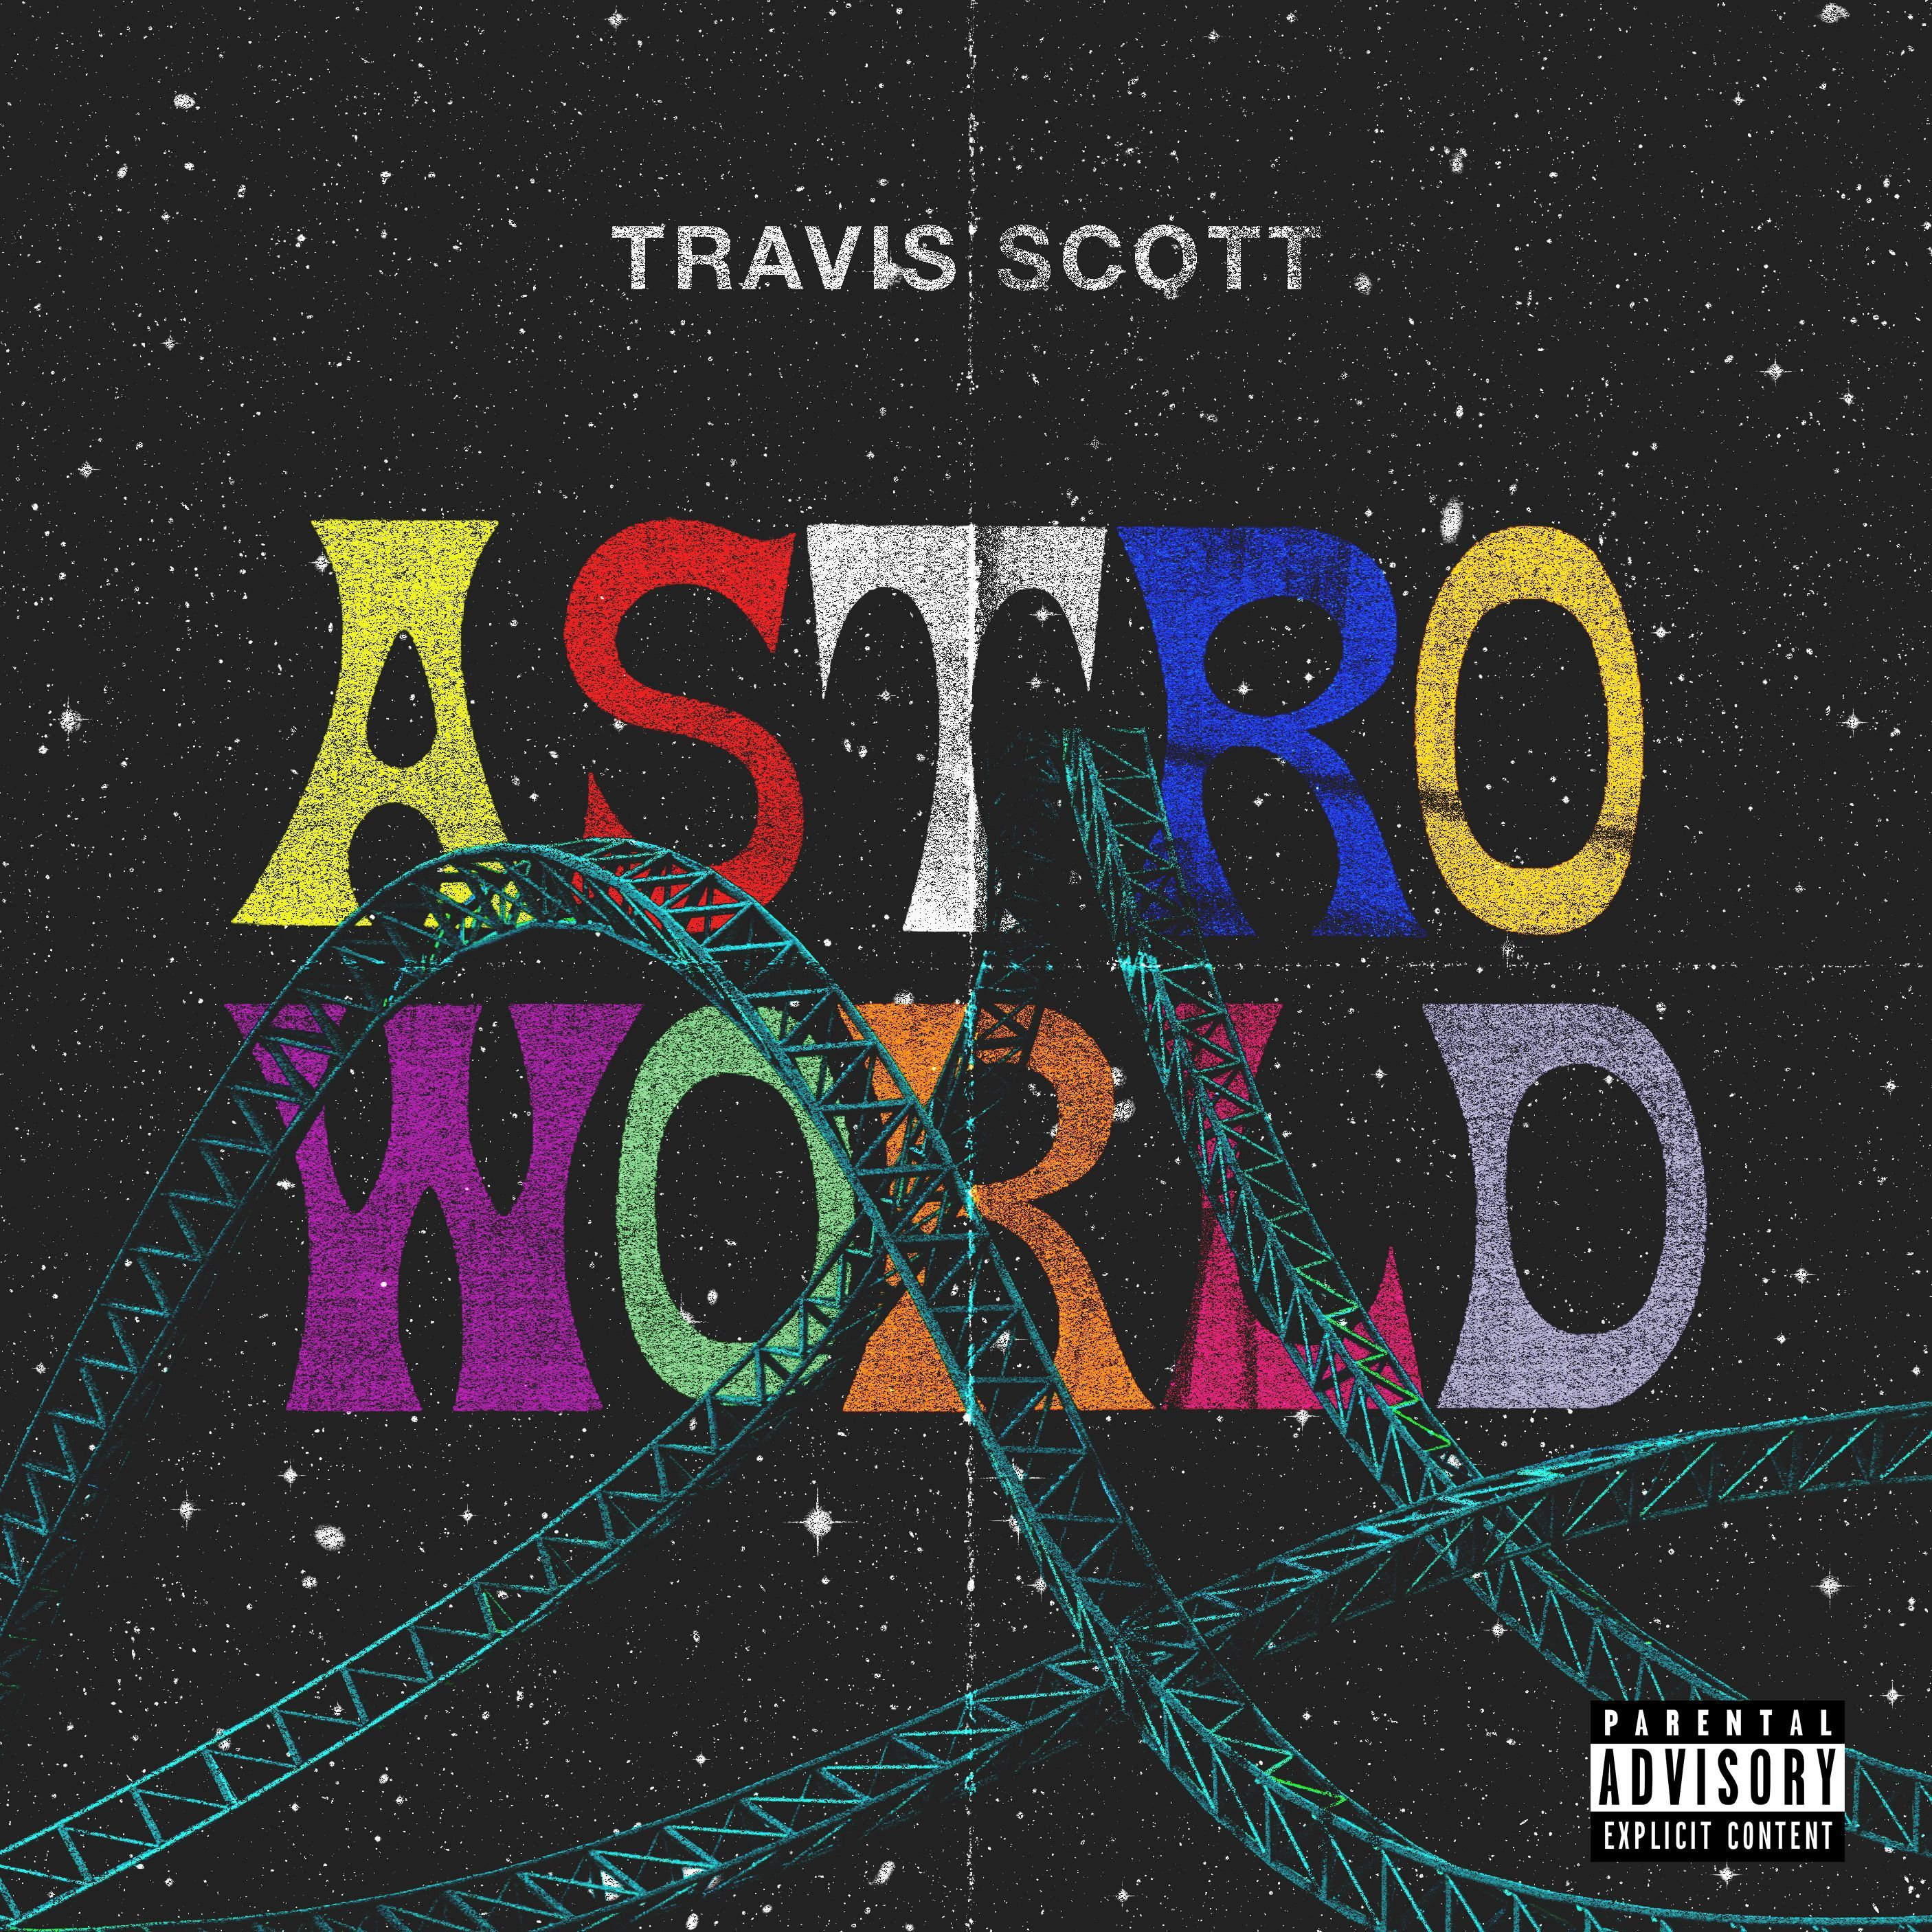 Travis Scott Logo Wallpapers Top Free Travis Scott Logo